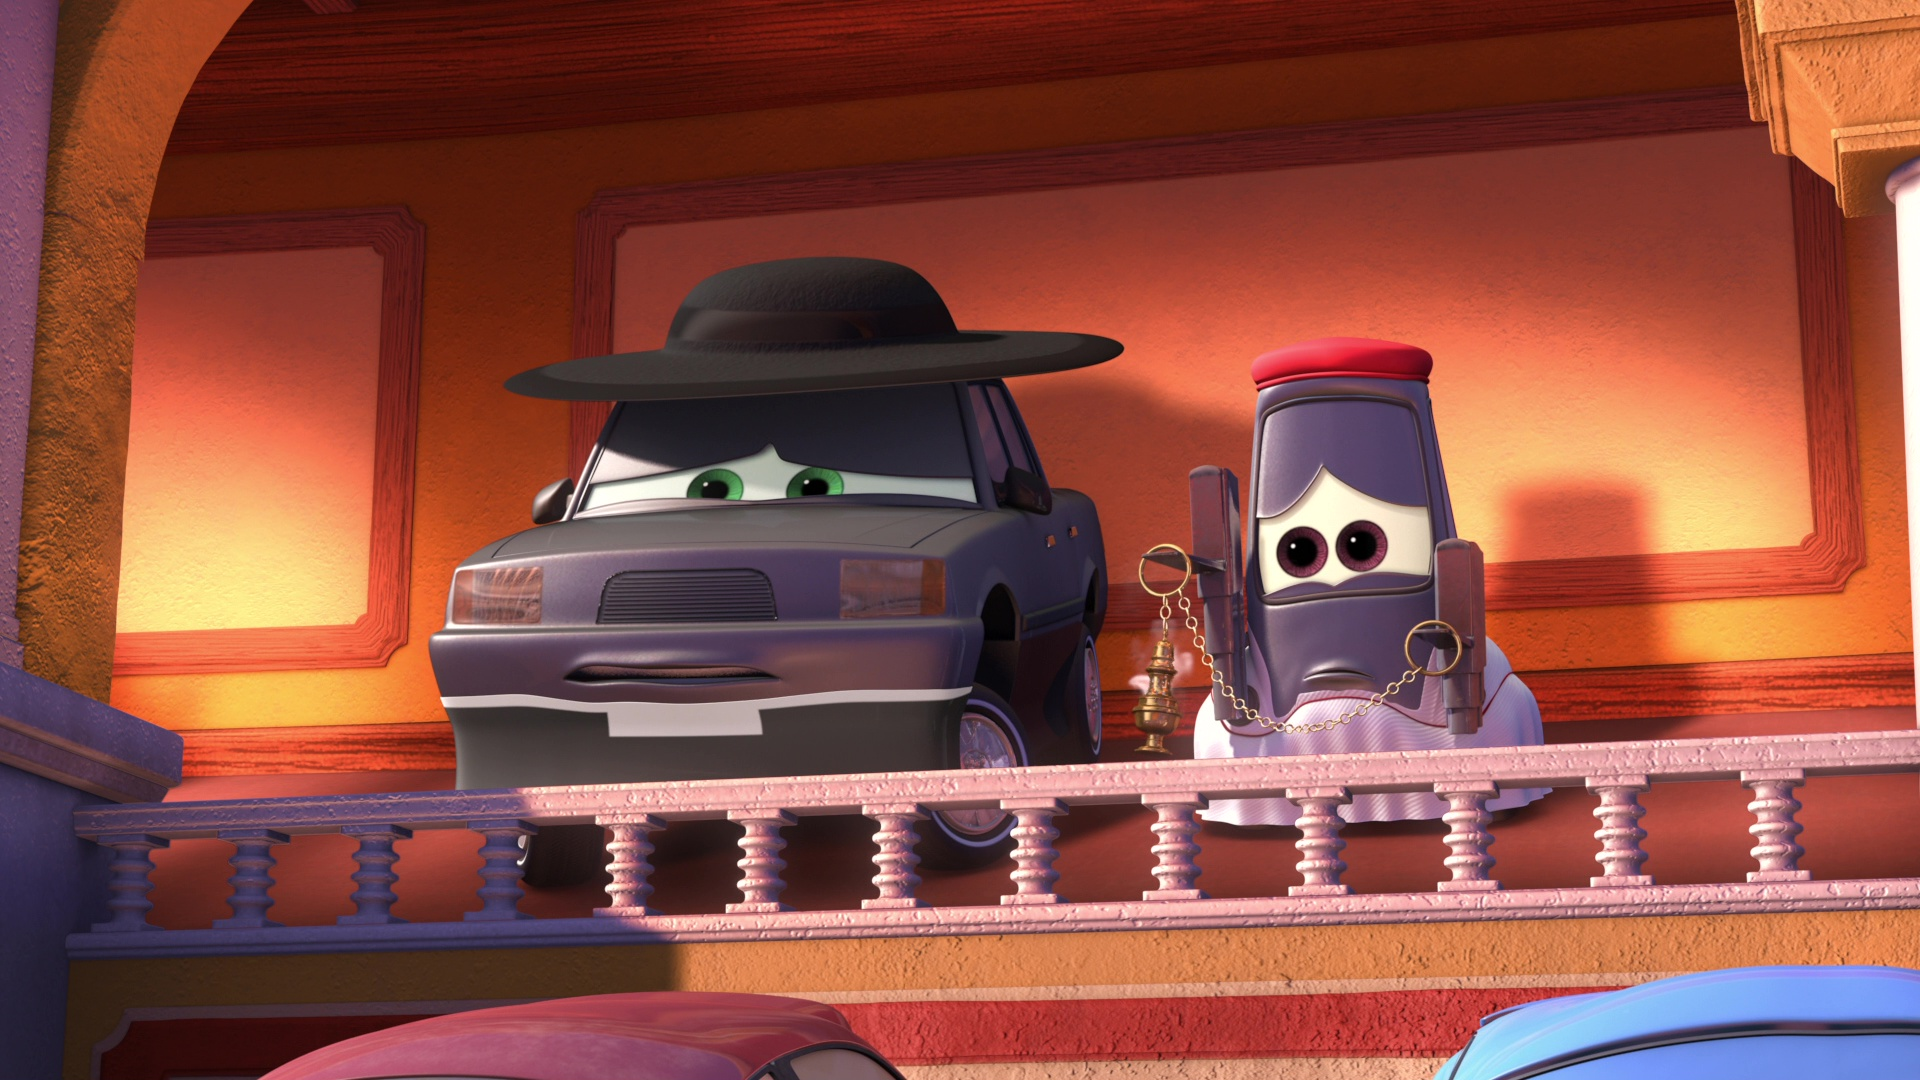 padre-cars-toon-el-martindor-01